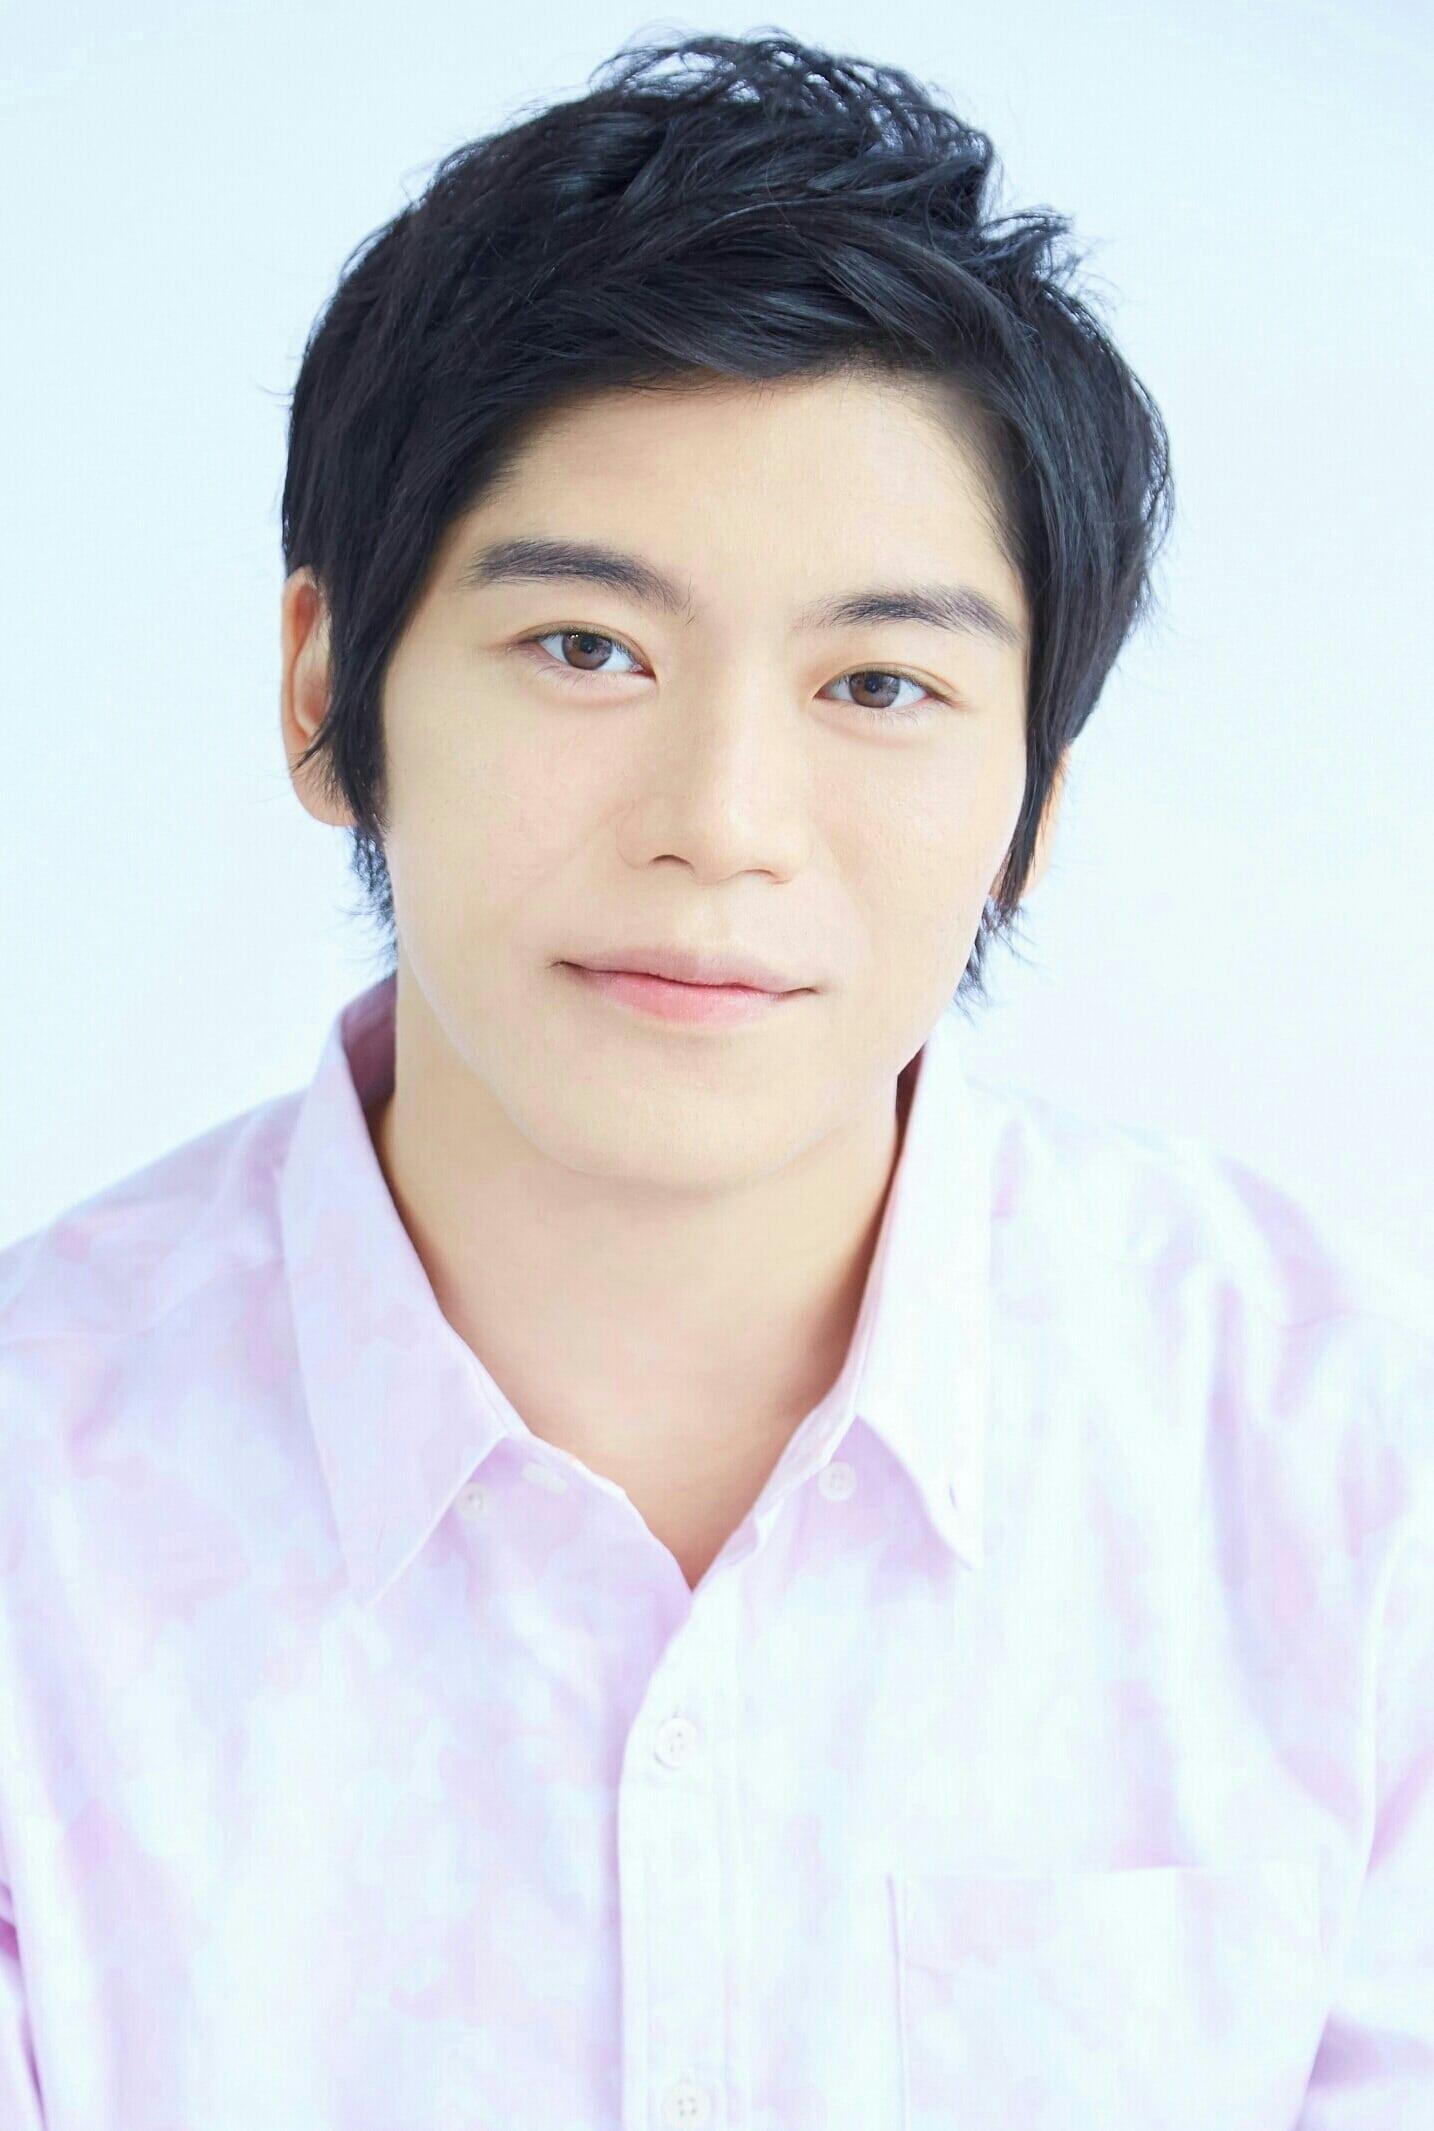 Makoto Furukawa